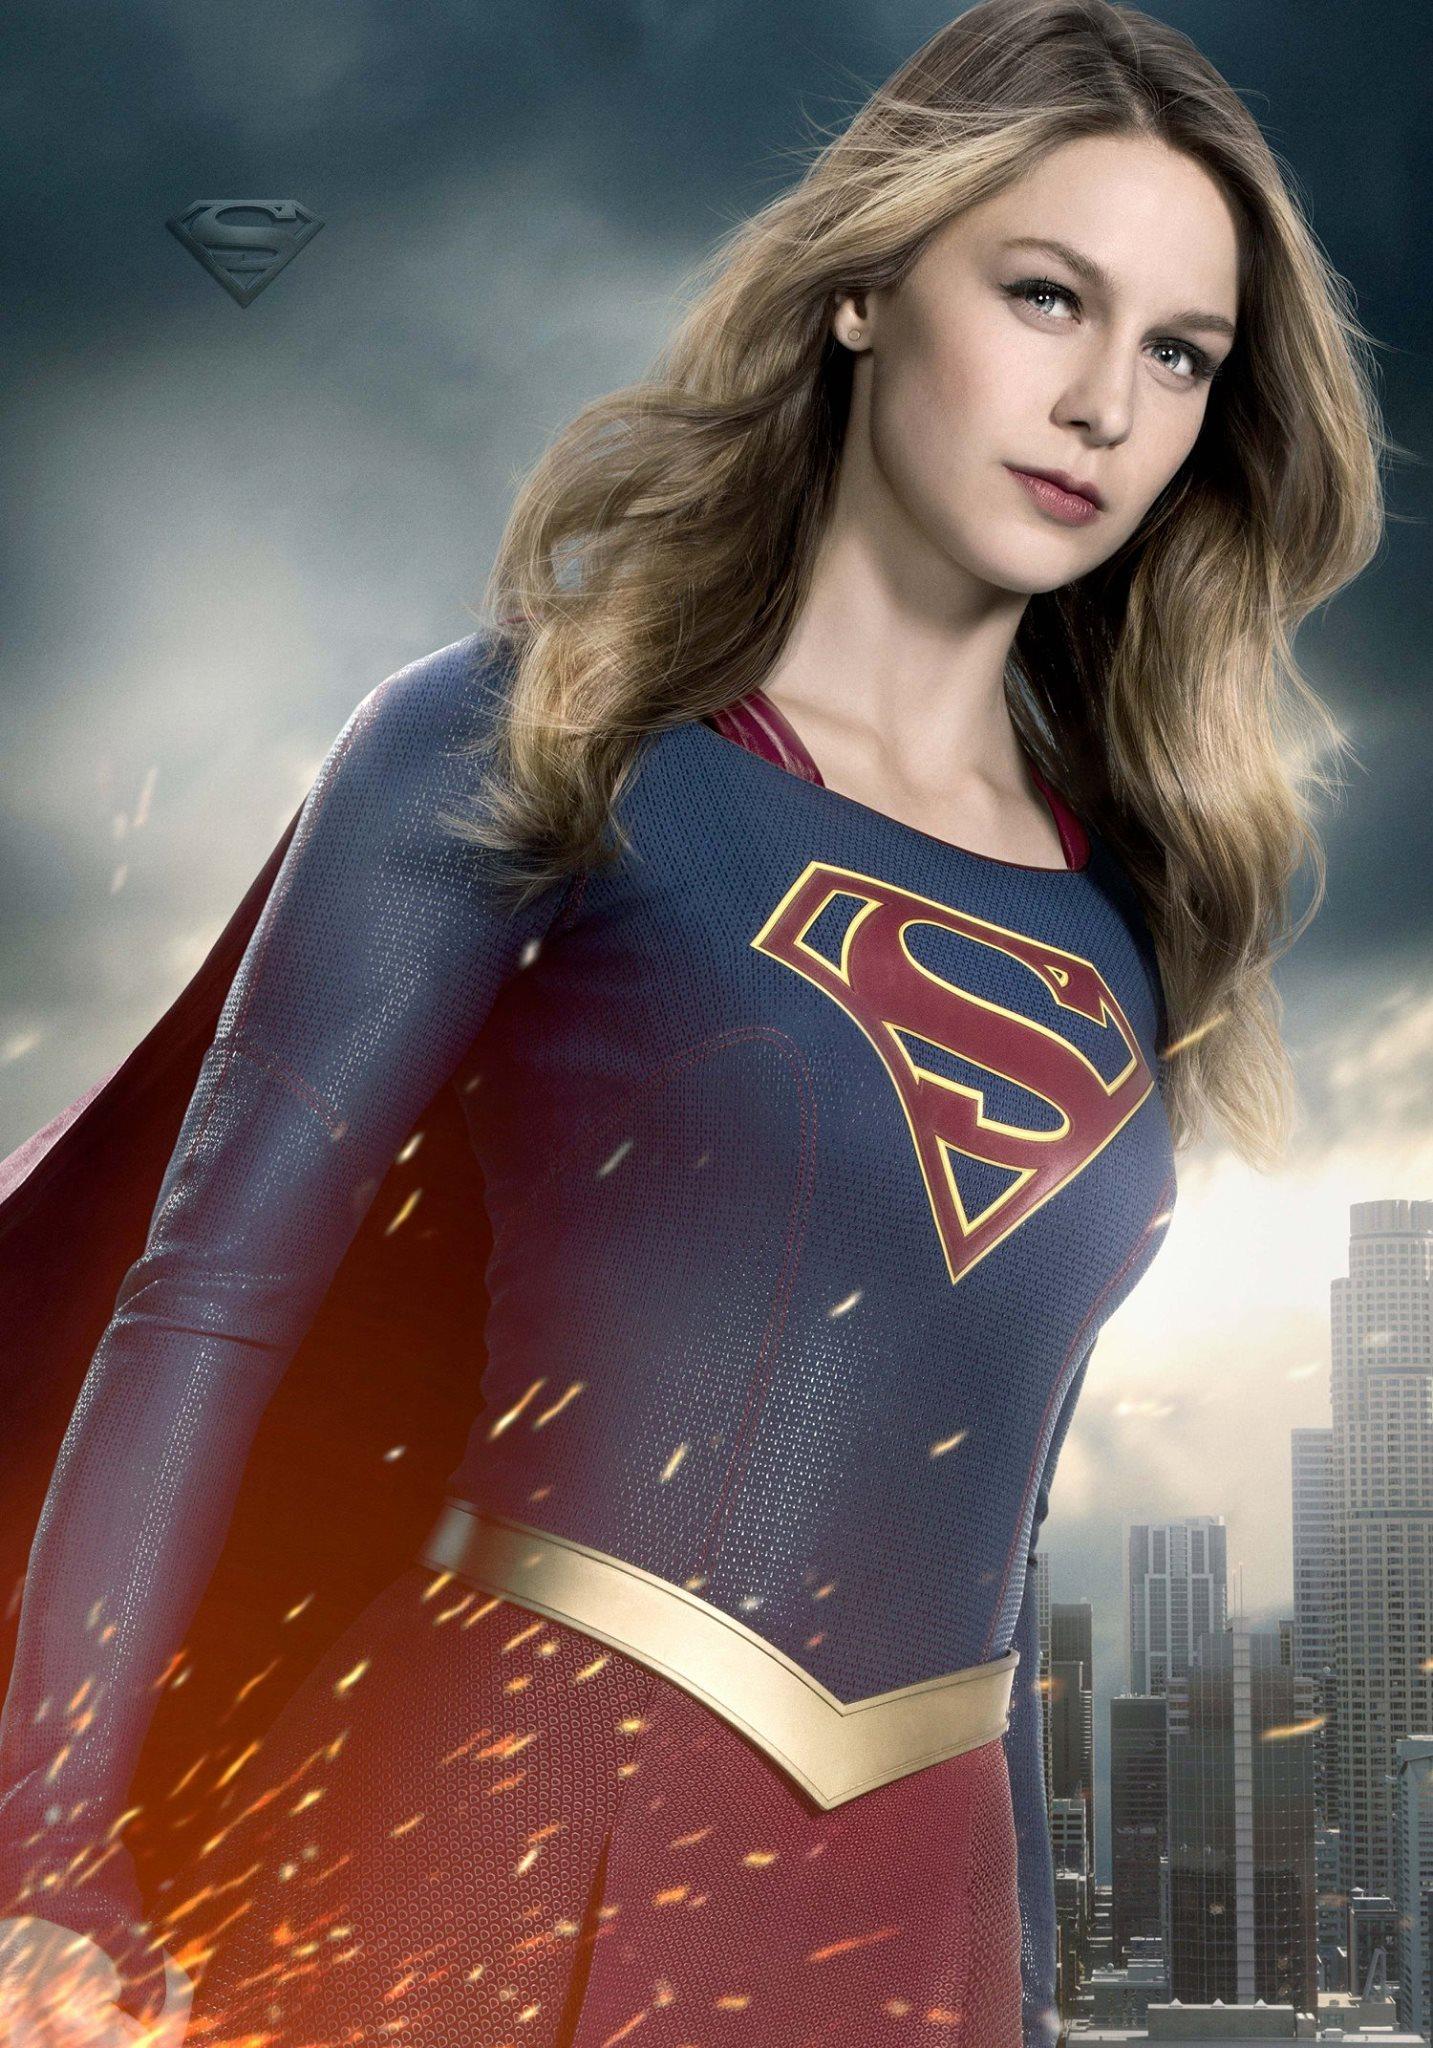 Supergirl Melissa Benoist Bottle Opener Kitchen, Dining & Bar